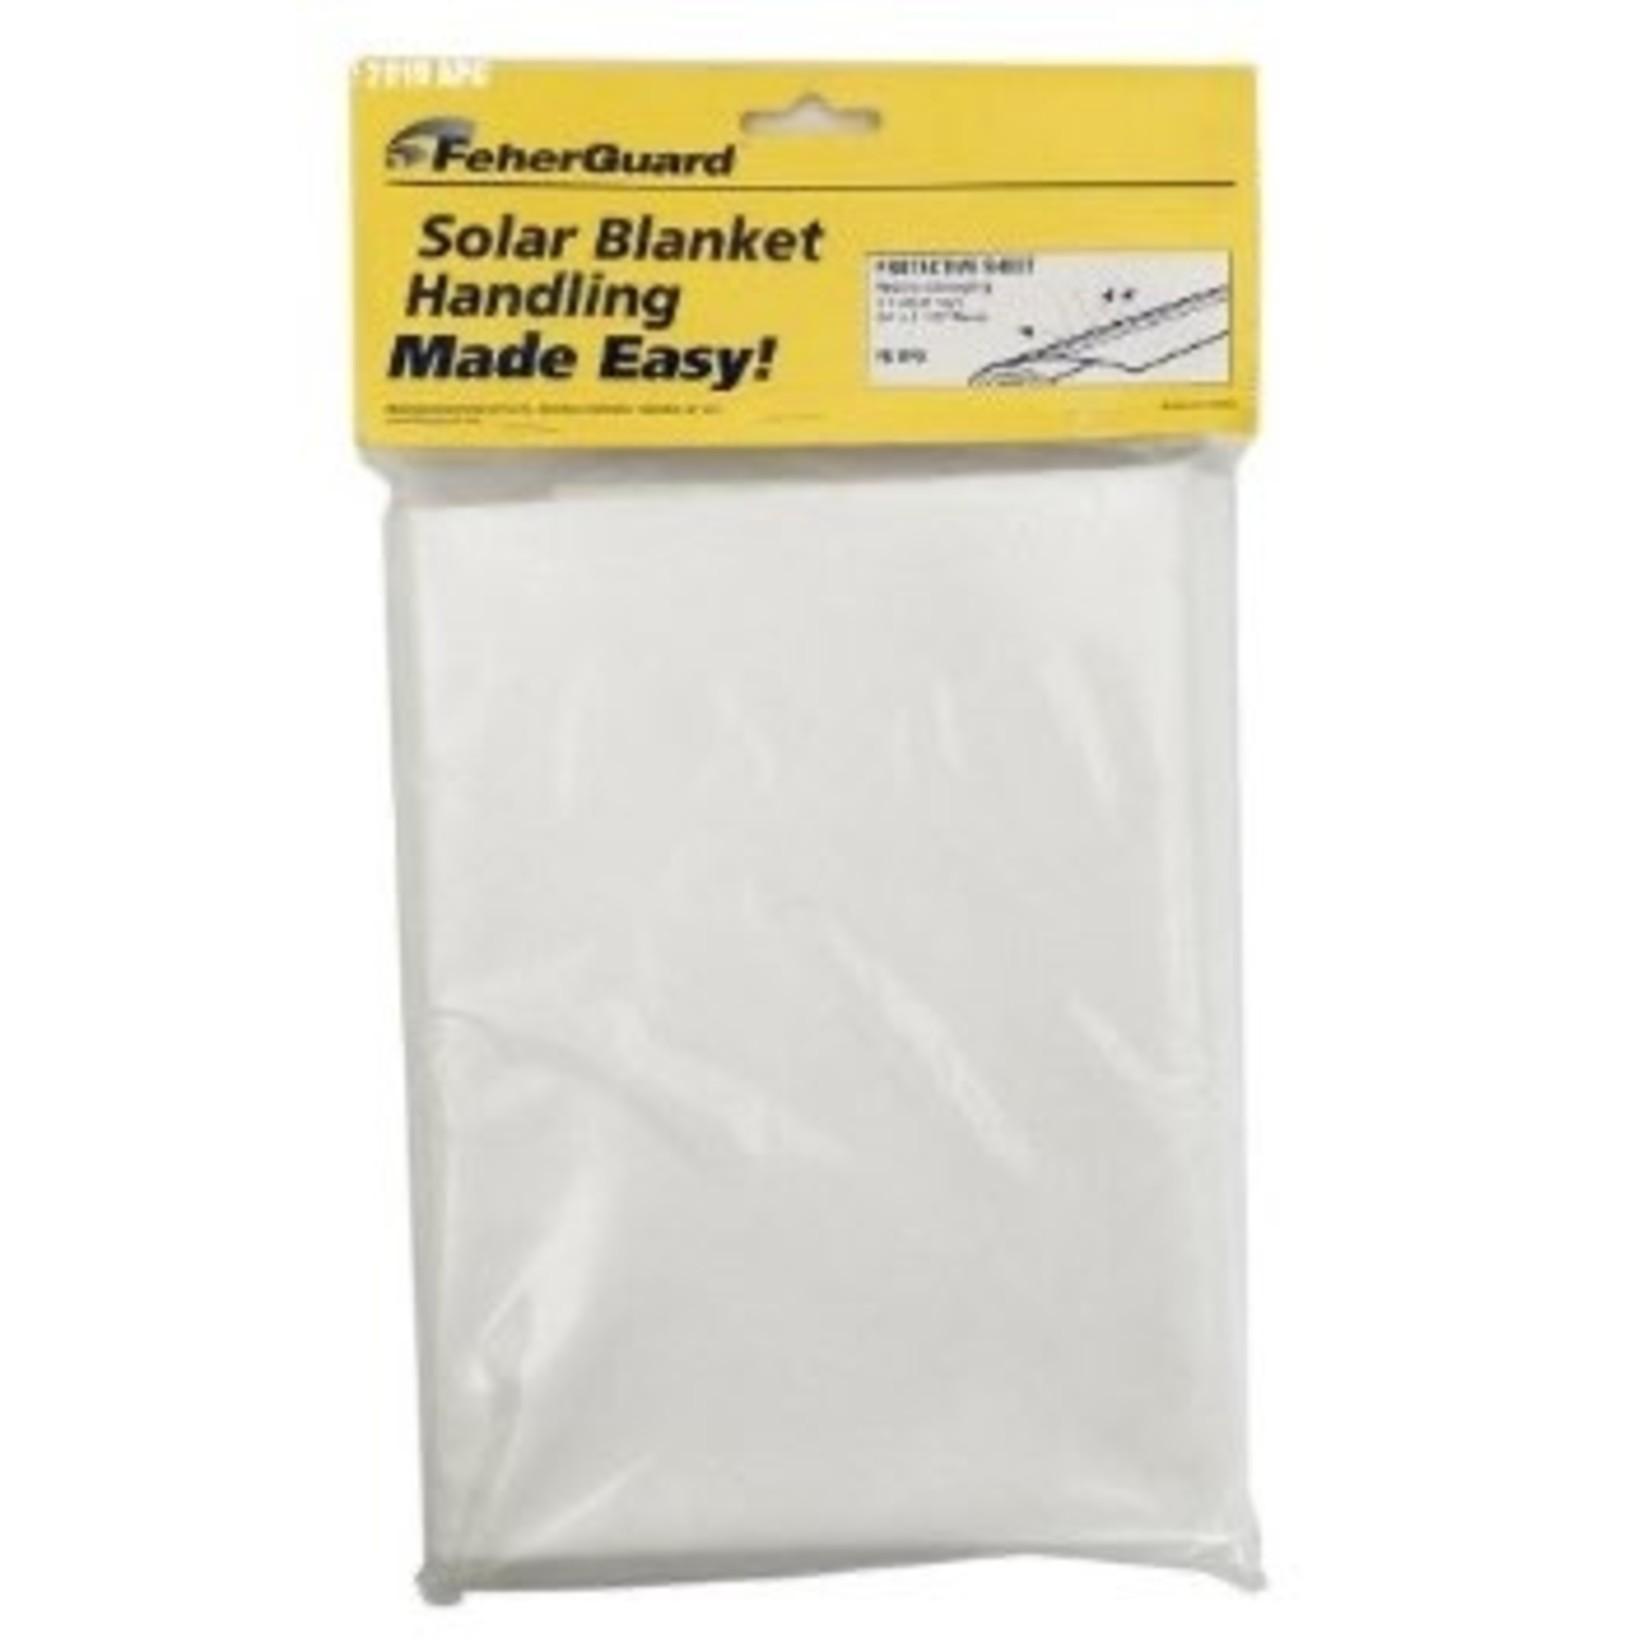 FEHERGUARD WHITE PROTECTIVE SHEET